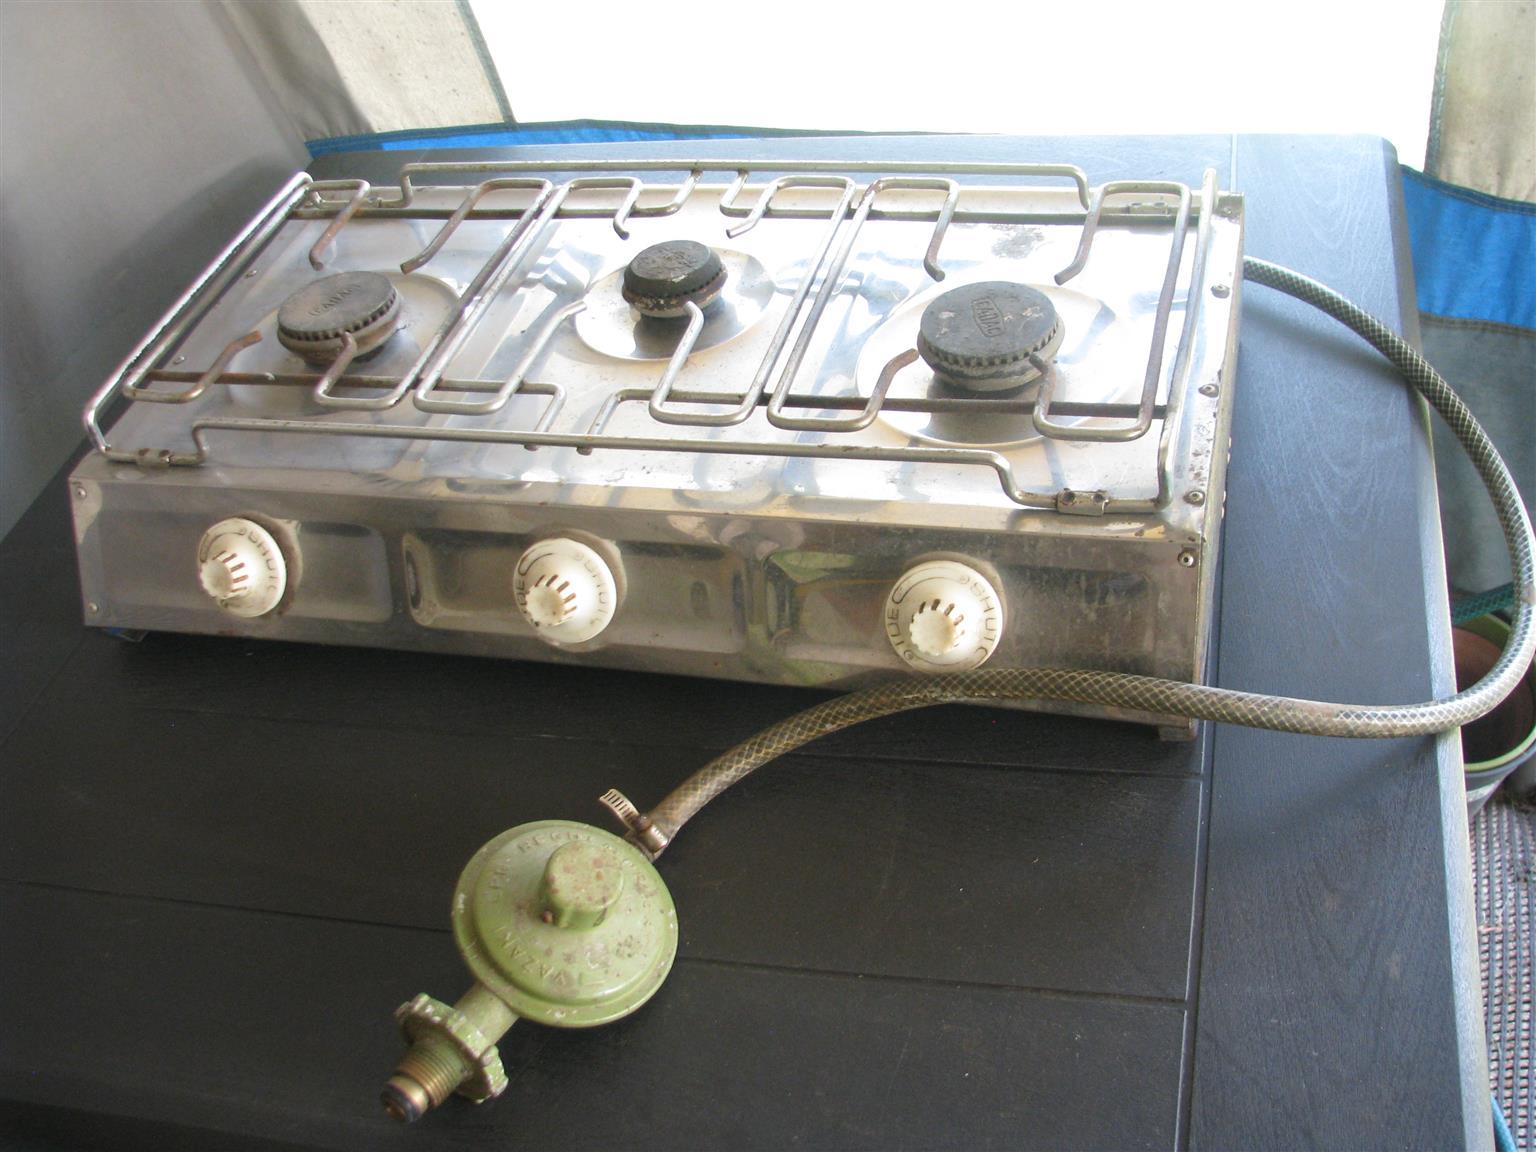 Cadac 3 burner cooker.